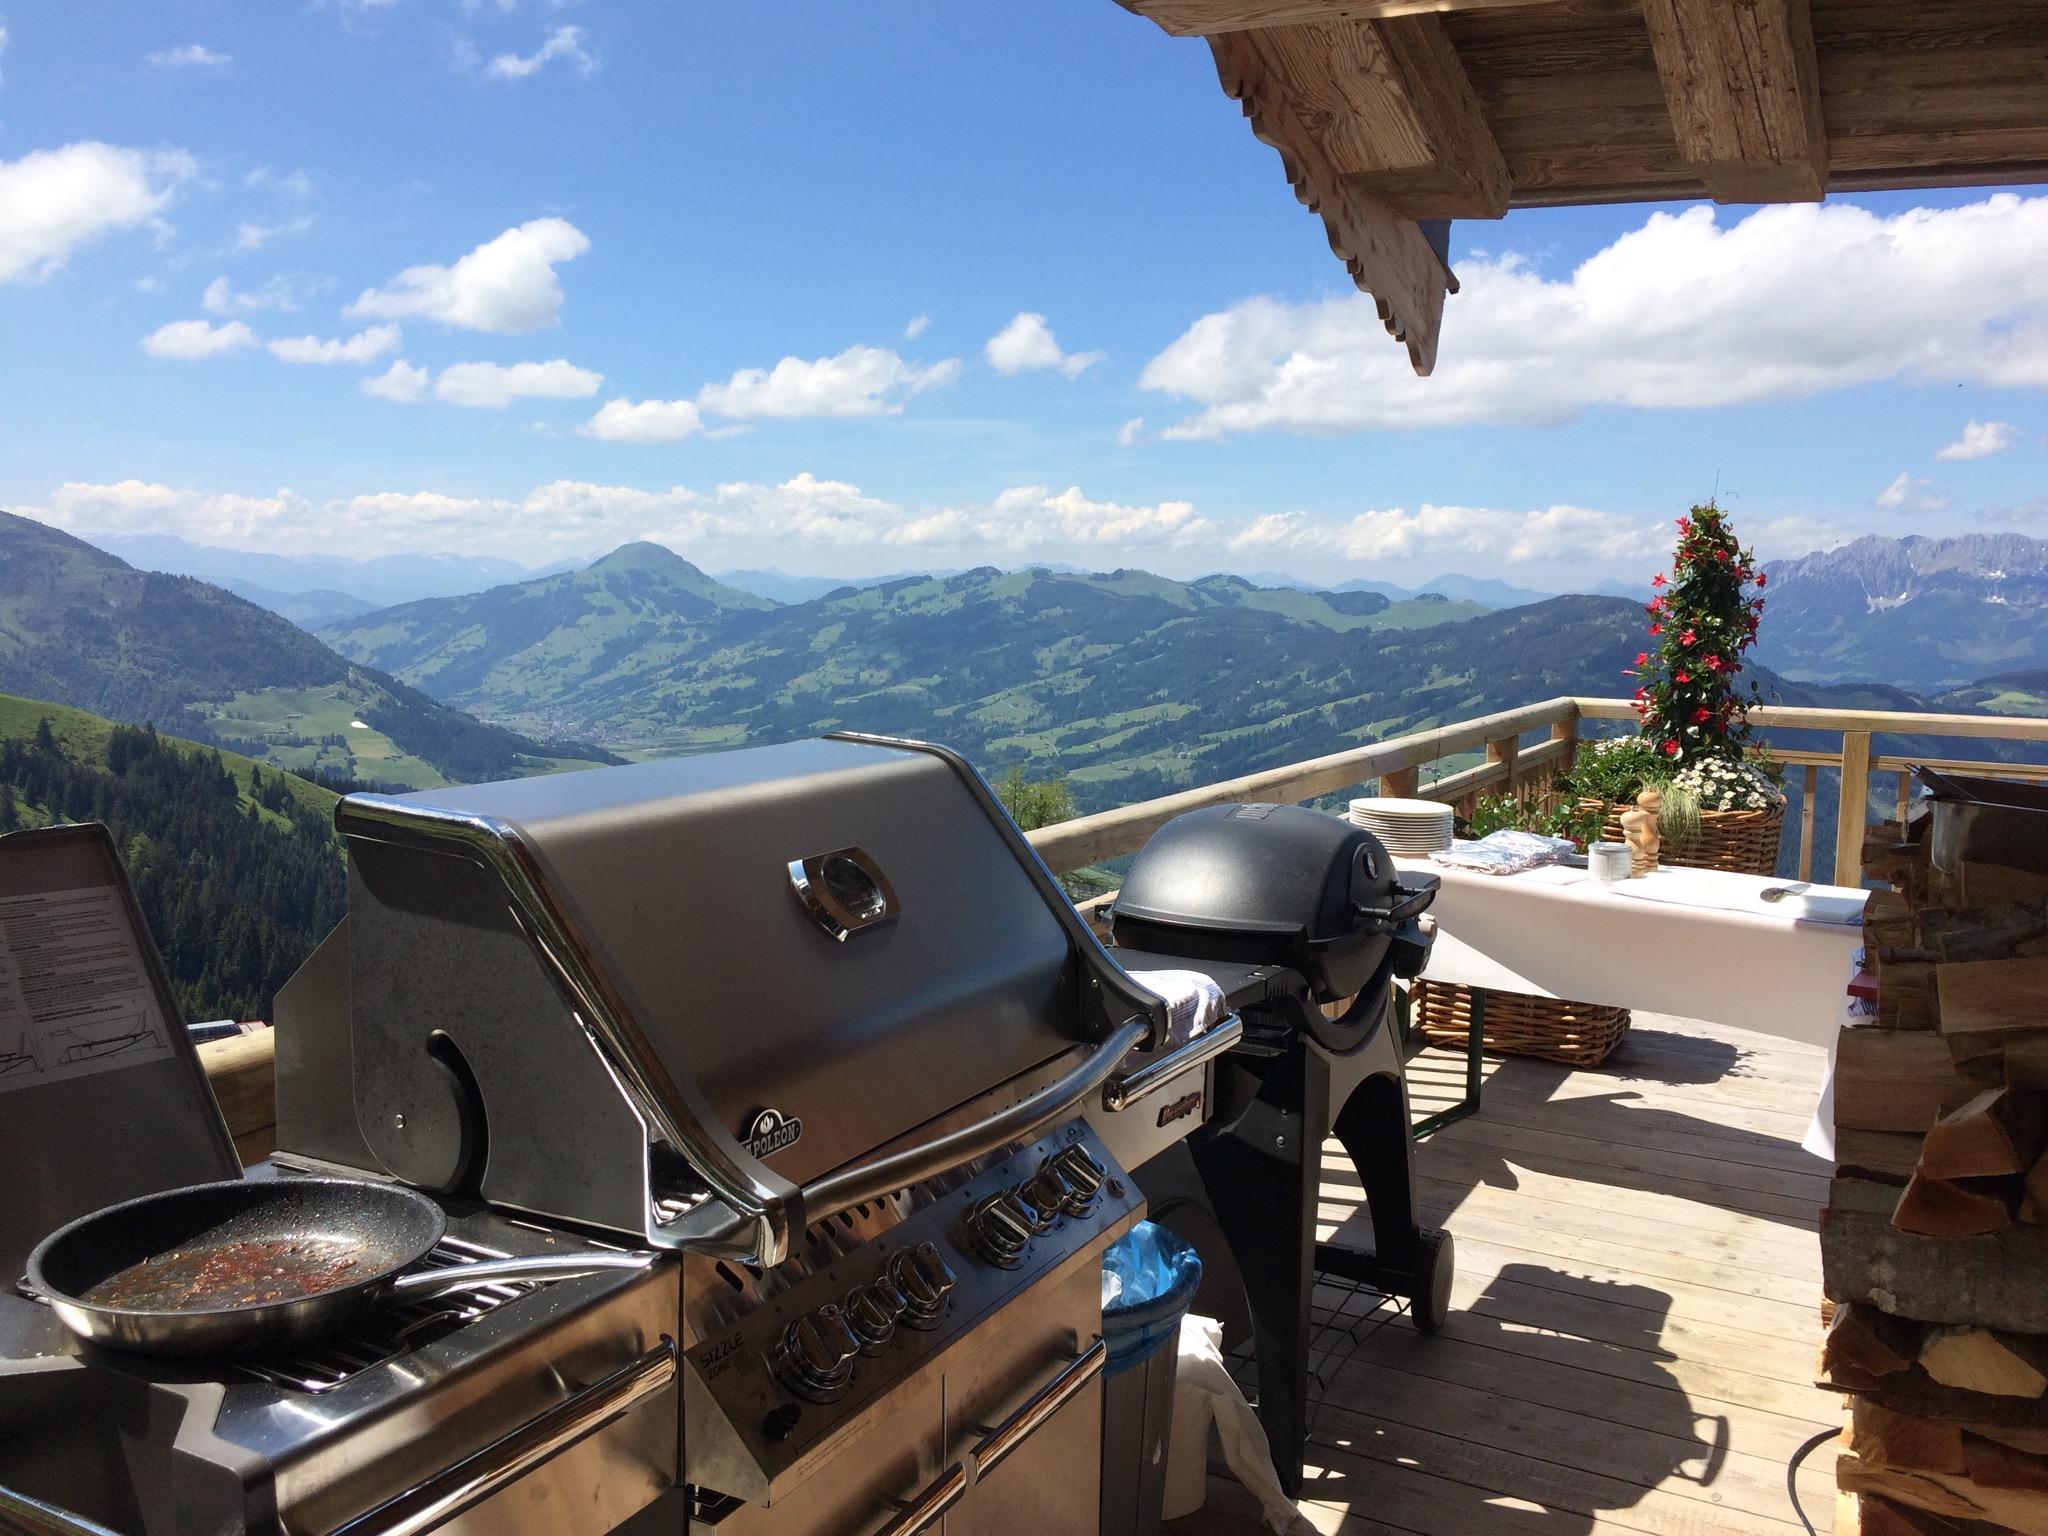 Cuisine-Lifestyle - Griller mit Berglandschaft